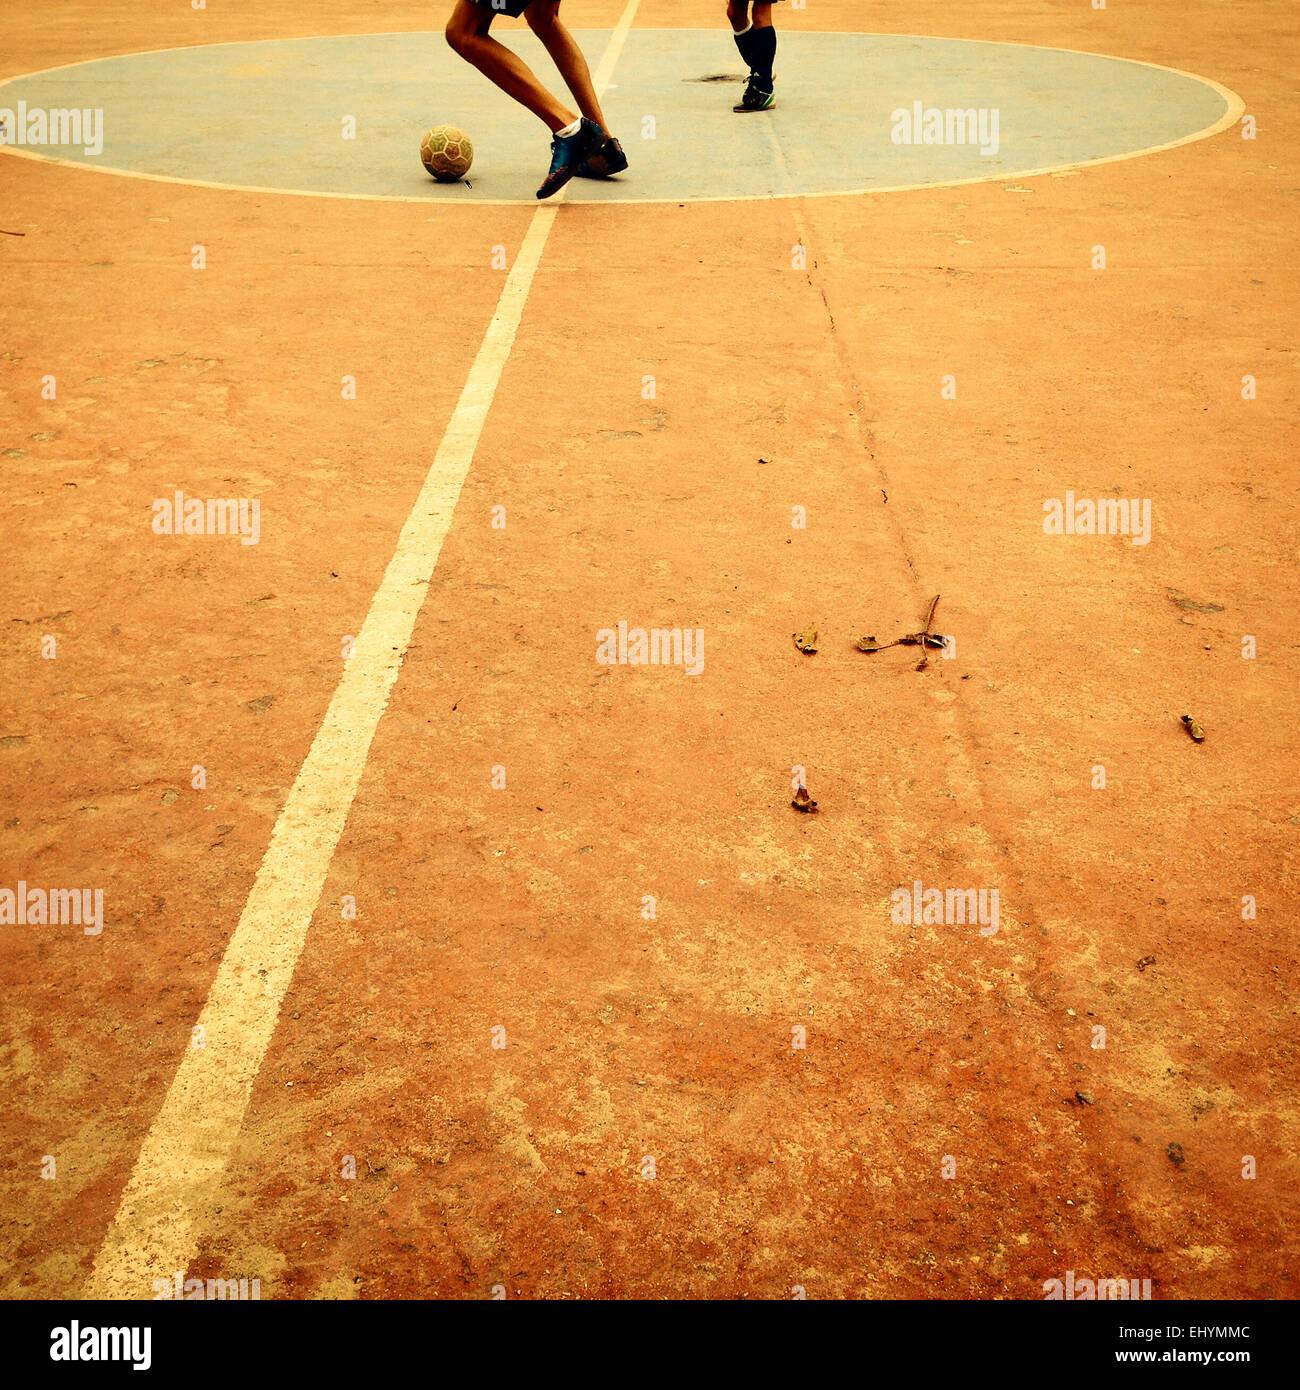 Jungen Fußball spielen Stockbild